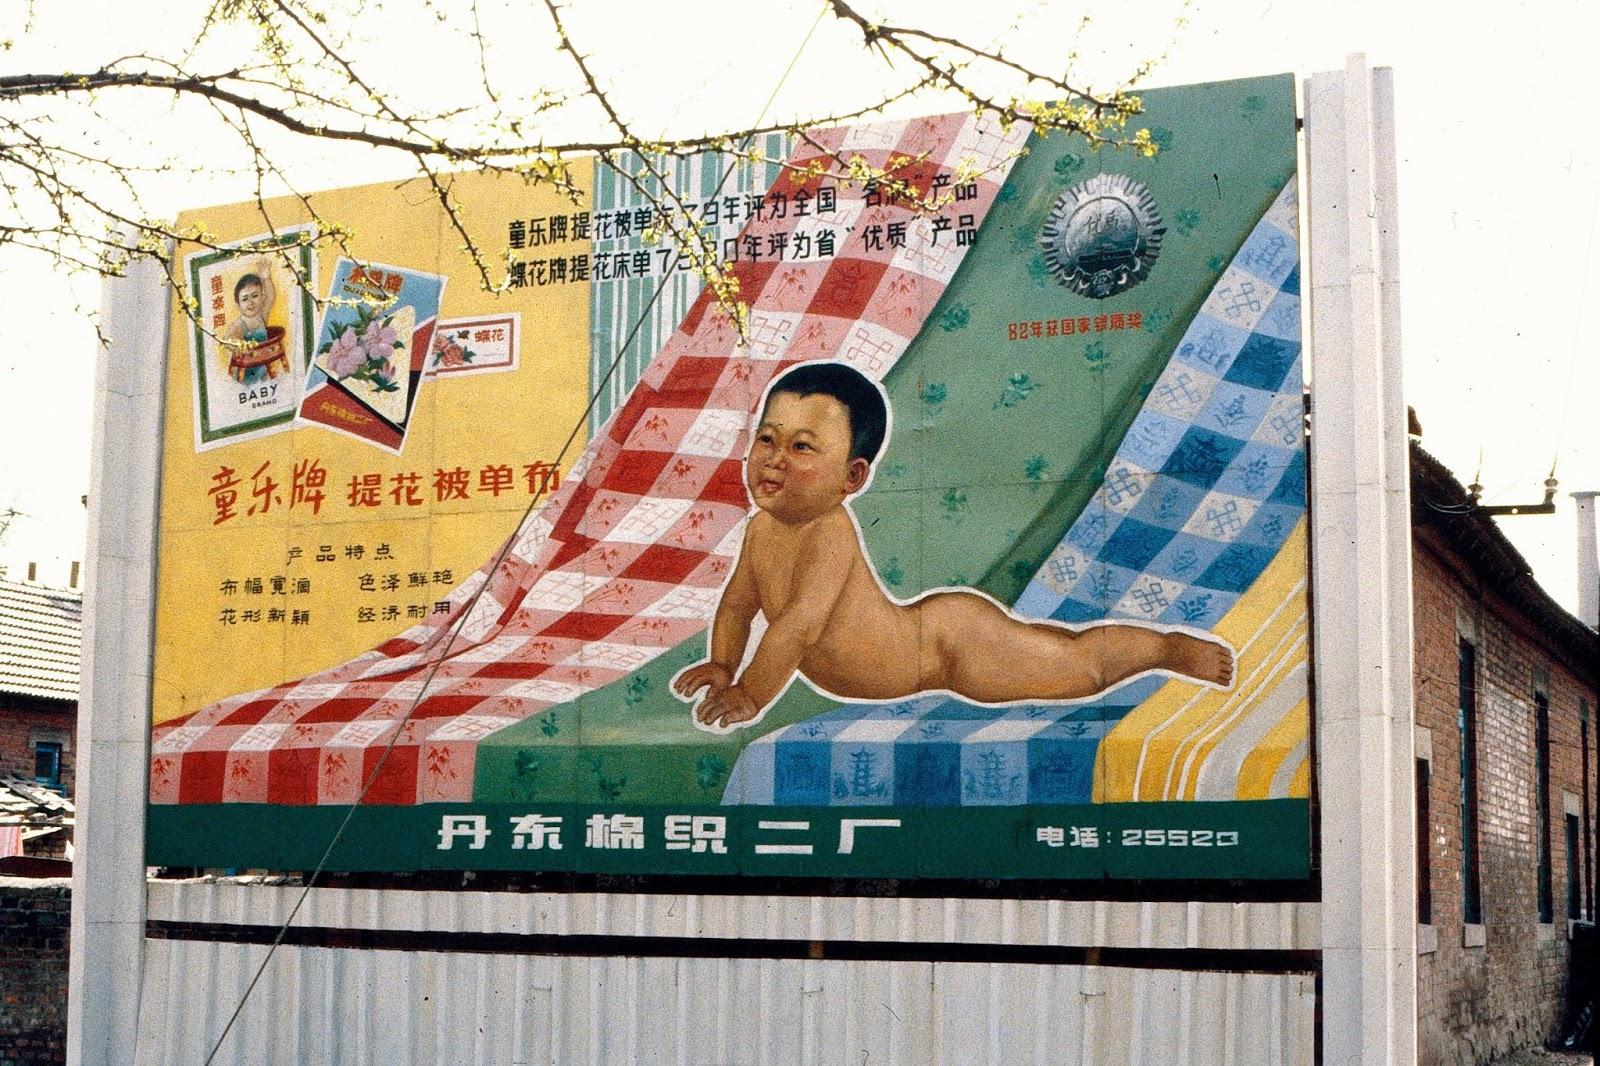 One-child policy propaganda billboard